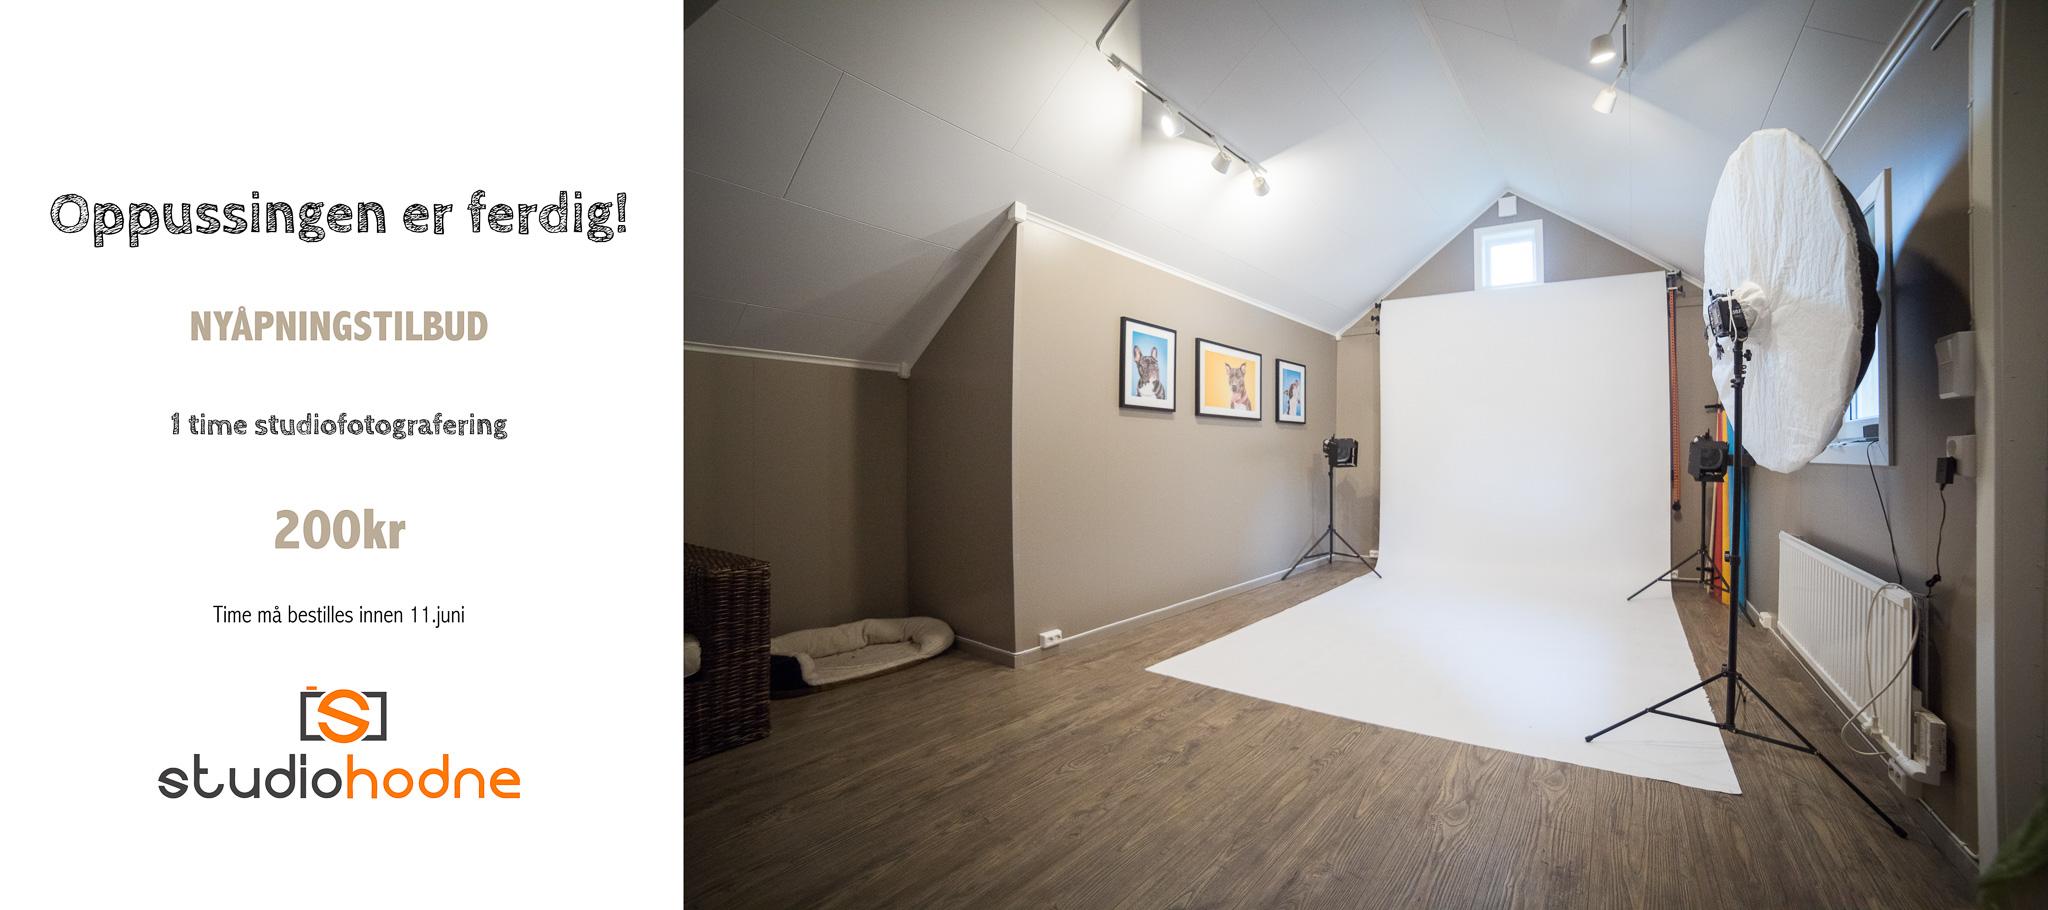 oppusset-studio-hodne-nyaapning-fotograf-sarpsborg-fredrikstad